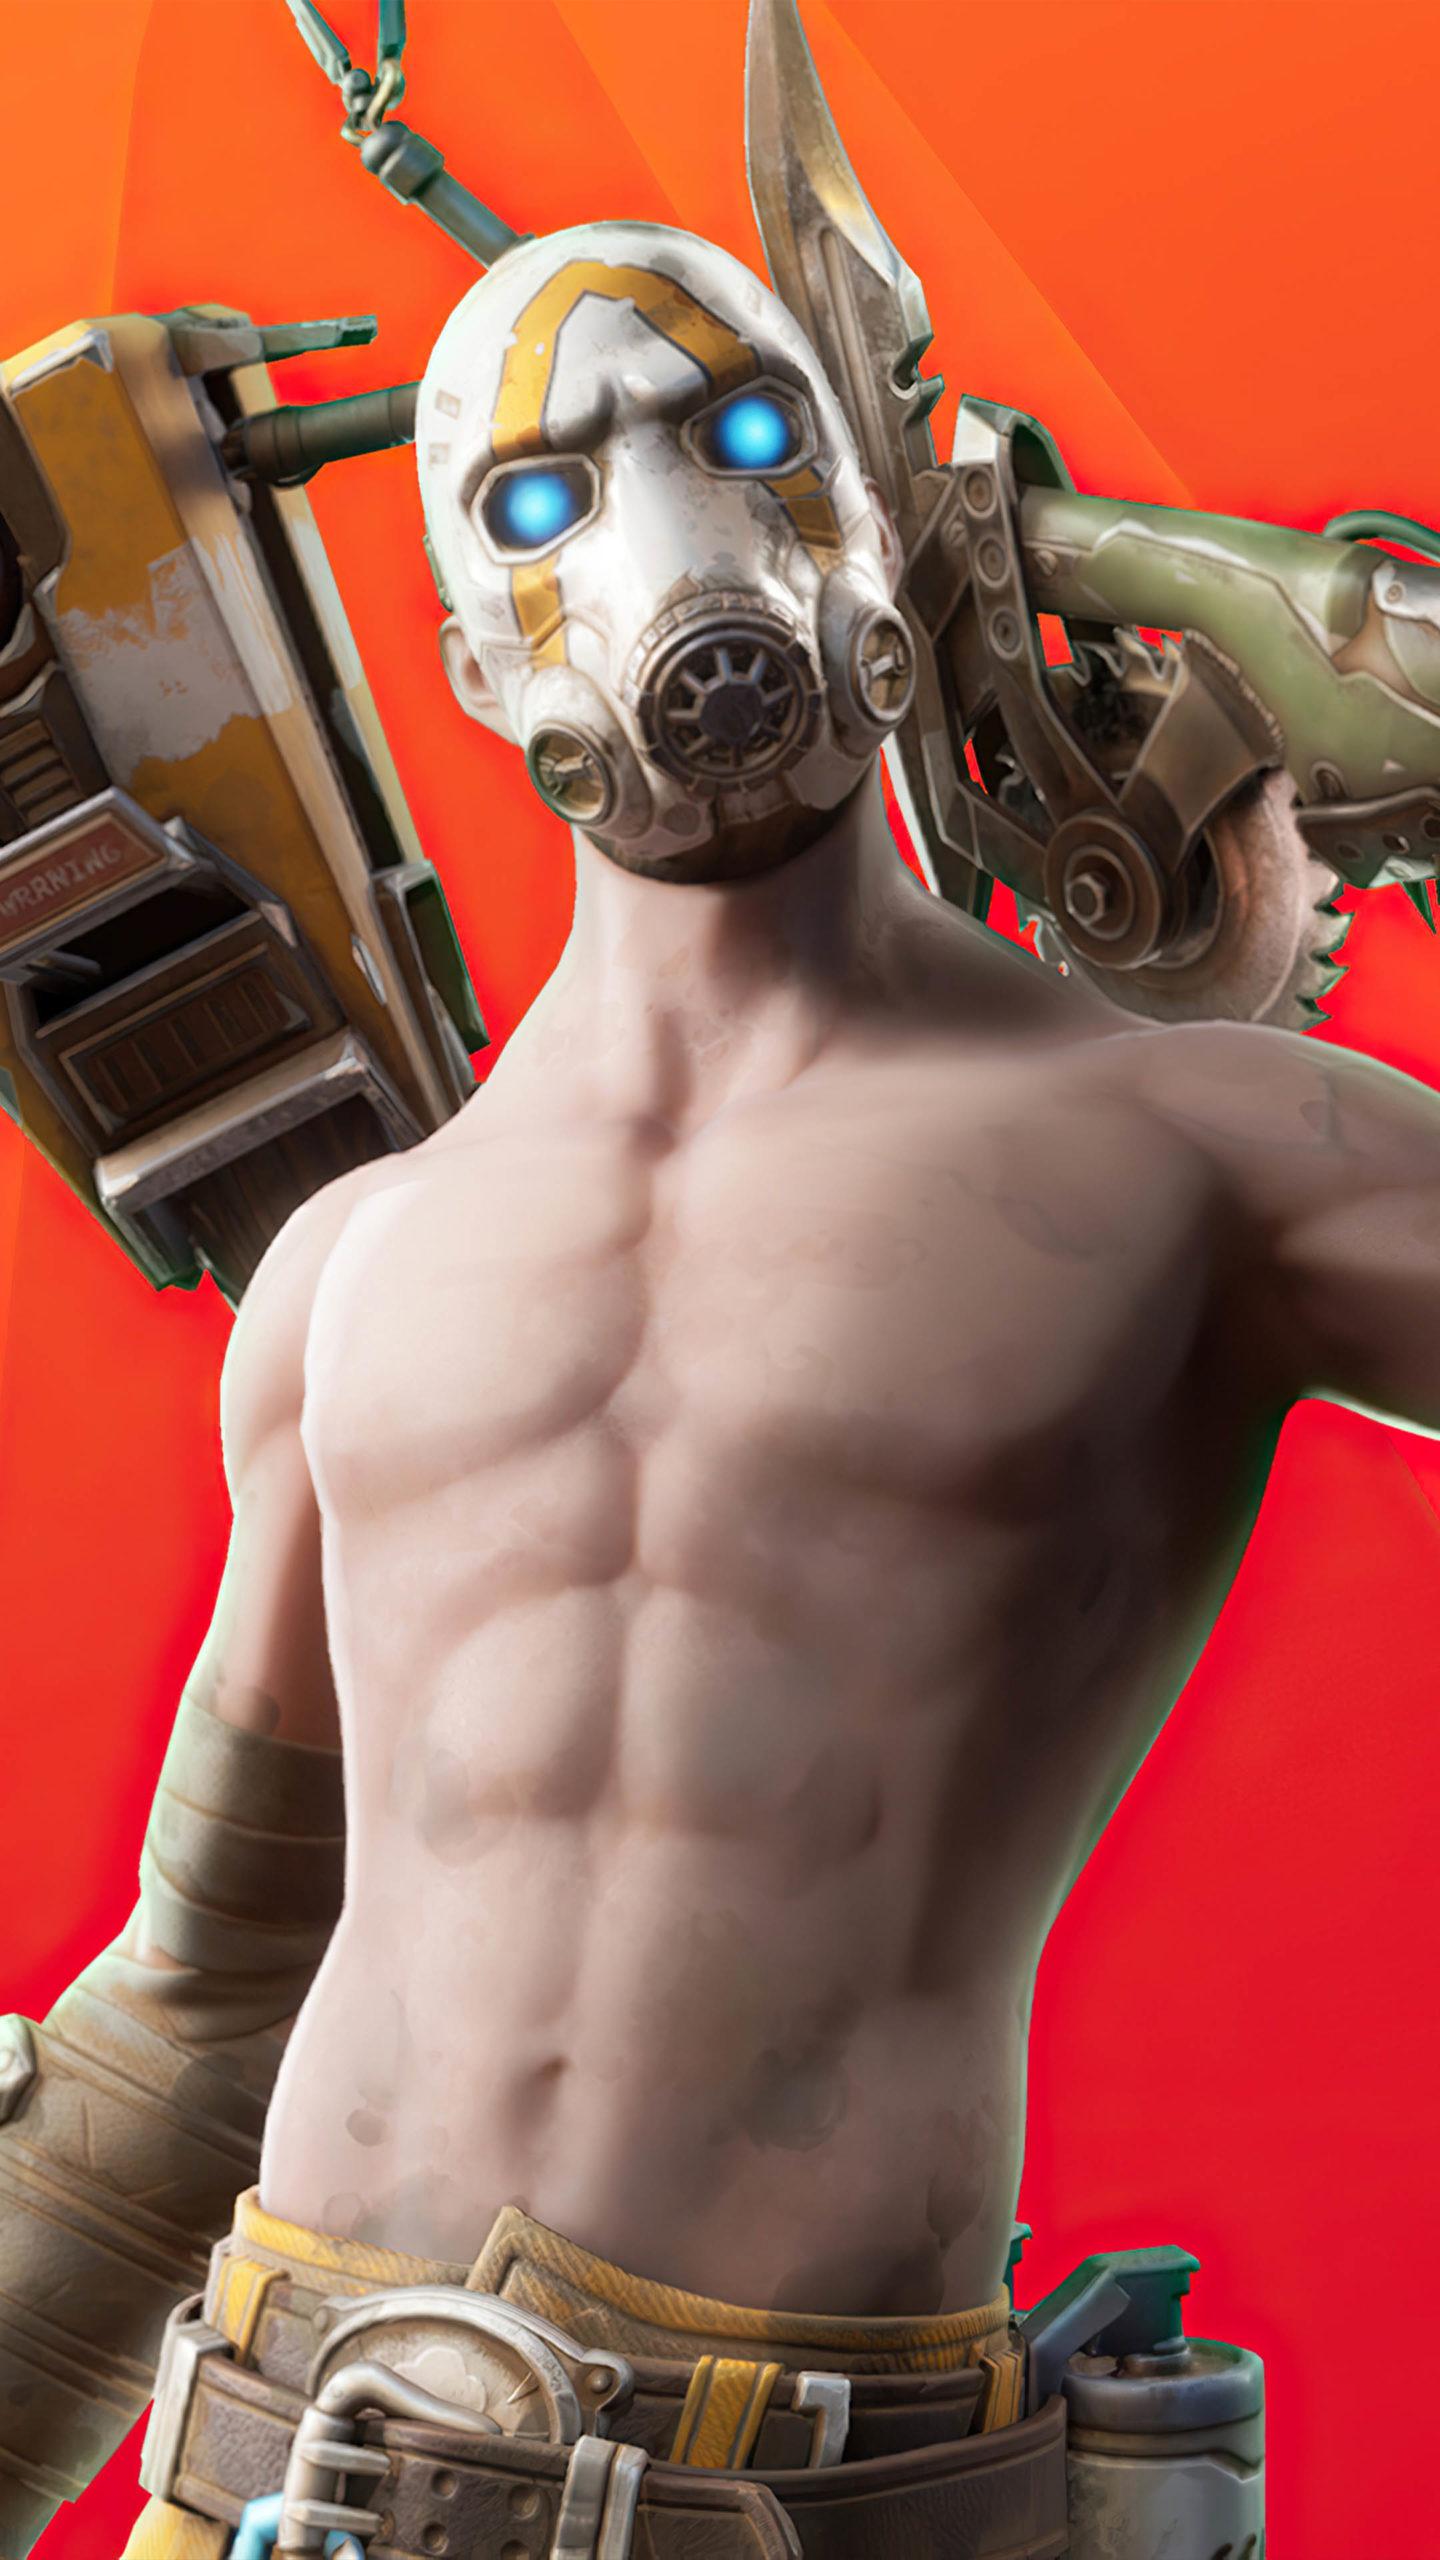 Psycho Fortnite Skin 4K Ultra HD Mobile Wallpaper